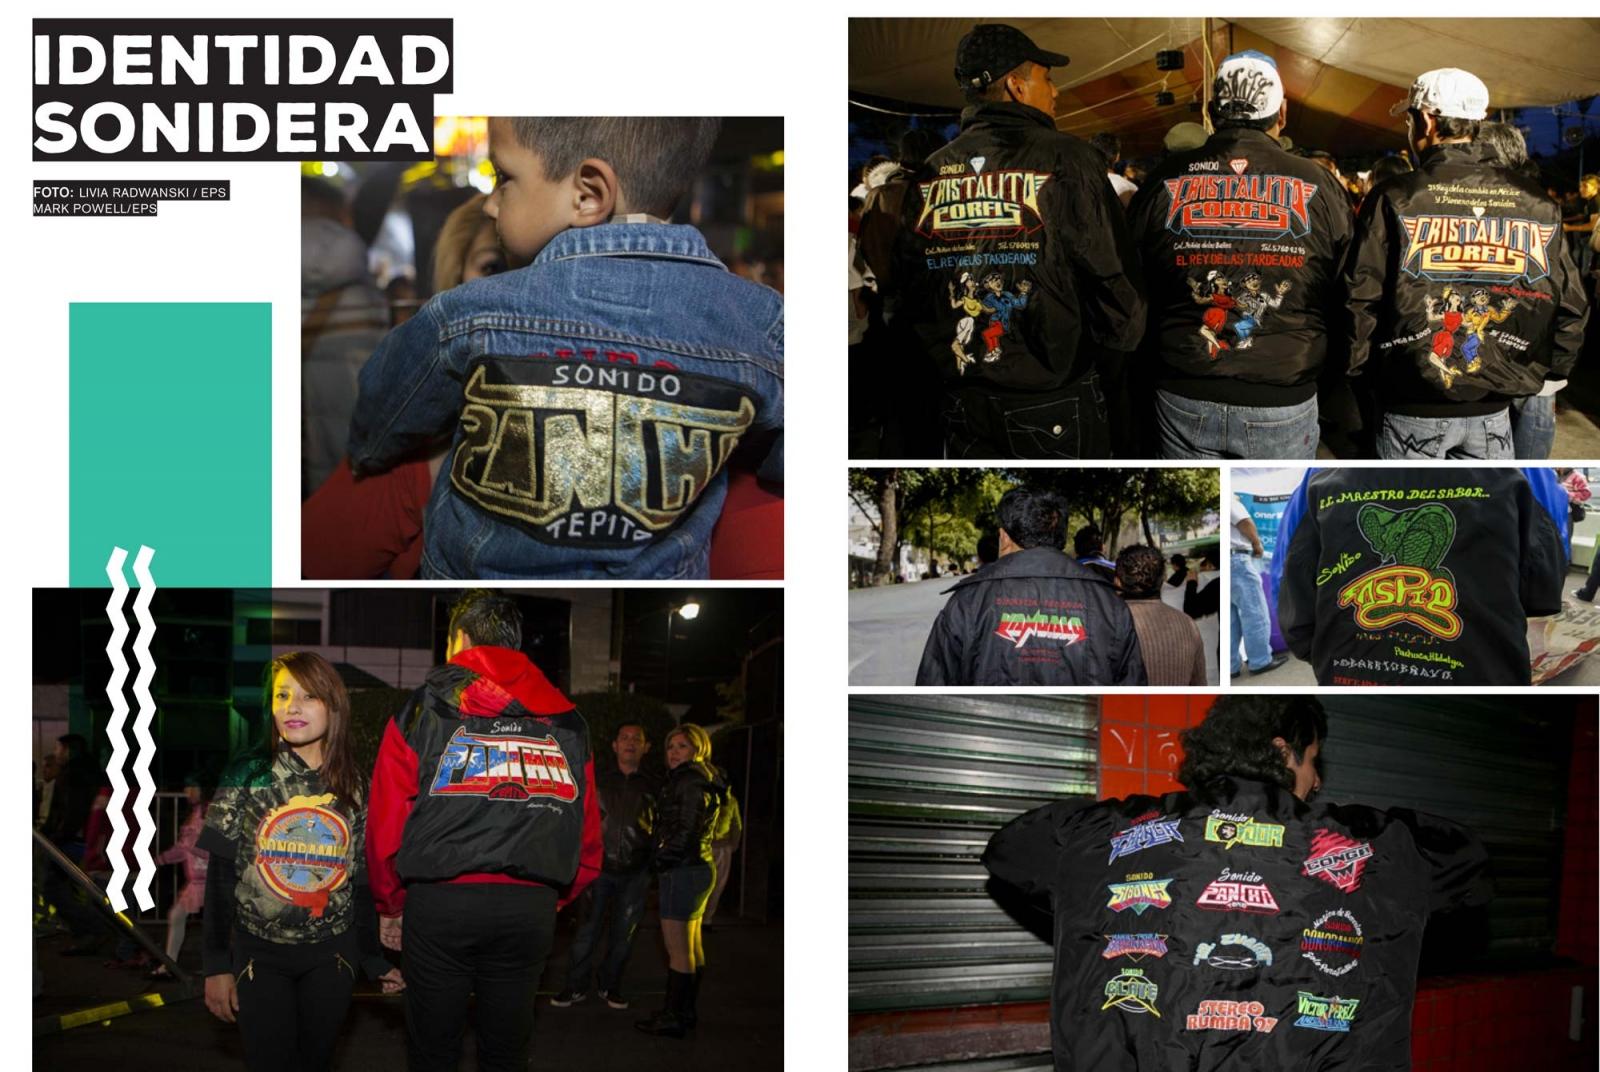 Art and Documentary Photography - Loading Bailen_espana_sonidero_3_depdf.jpg